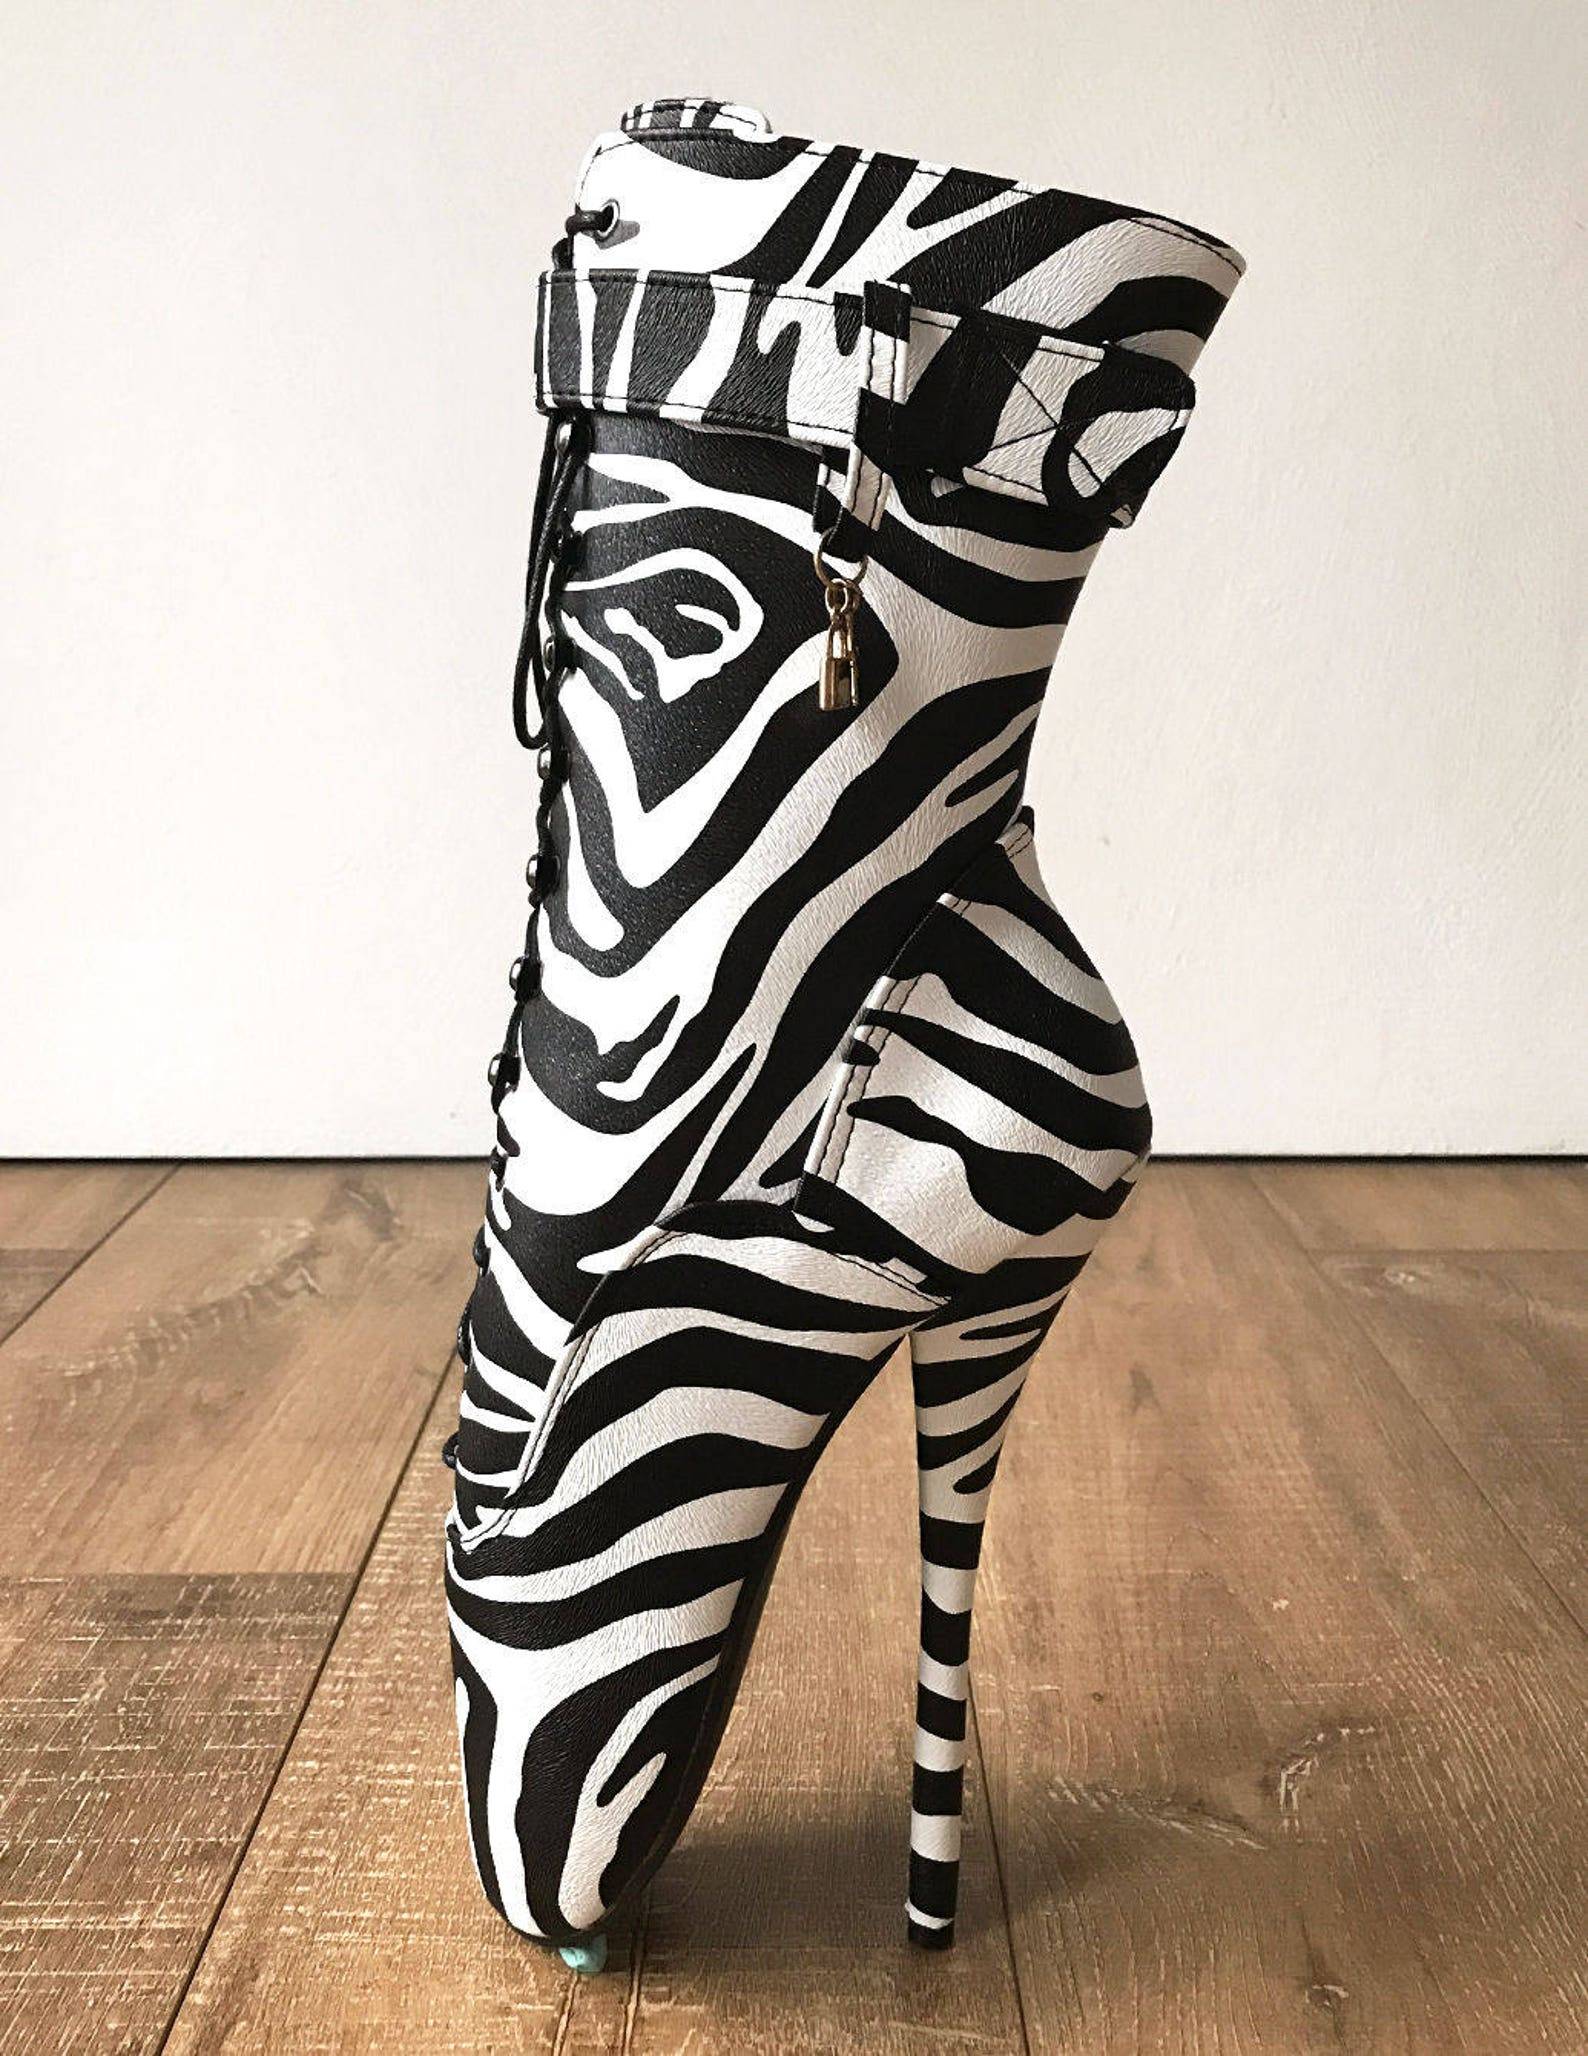 18cm ballet zebra print textured calf hi fetish boot charm burlesque dominatrix